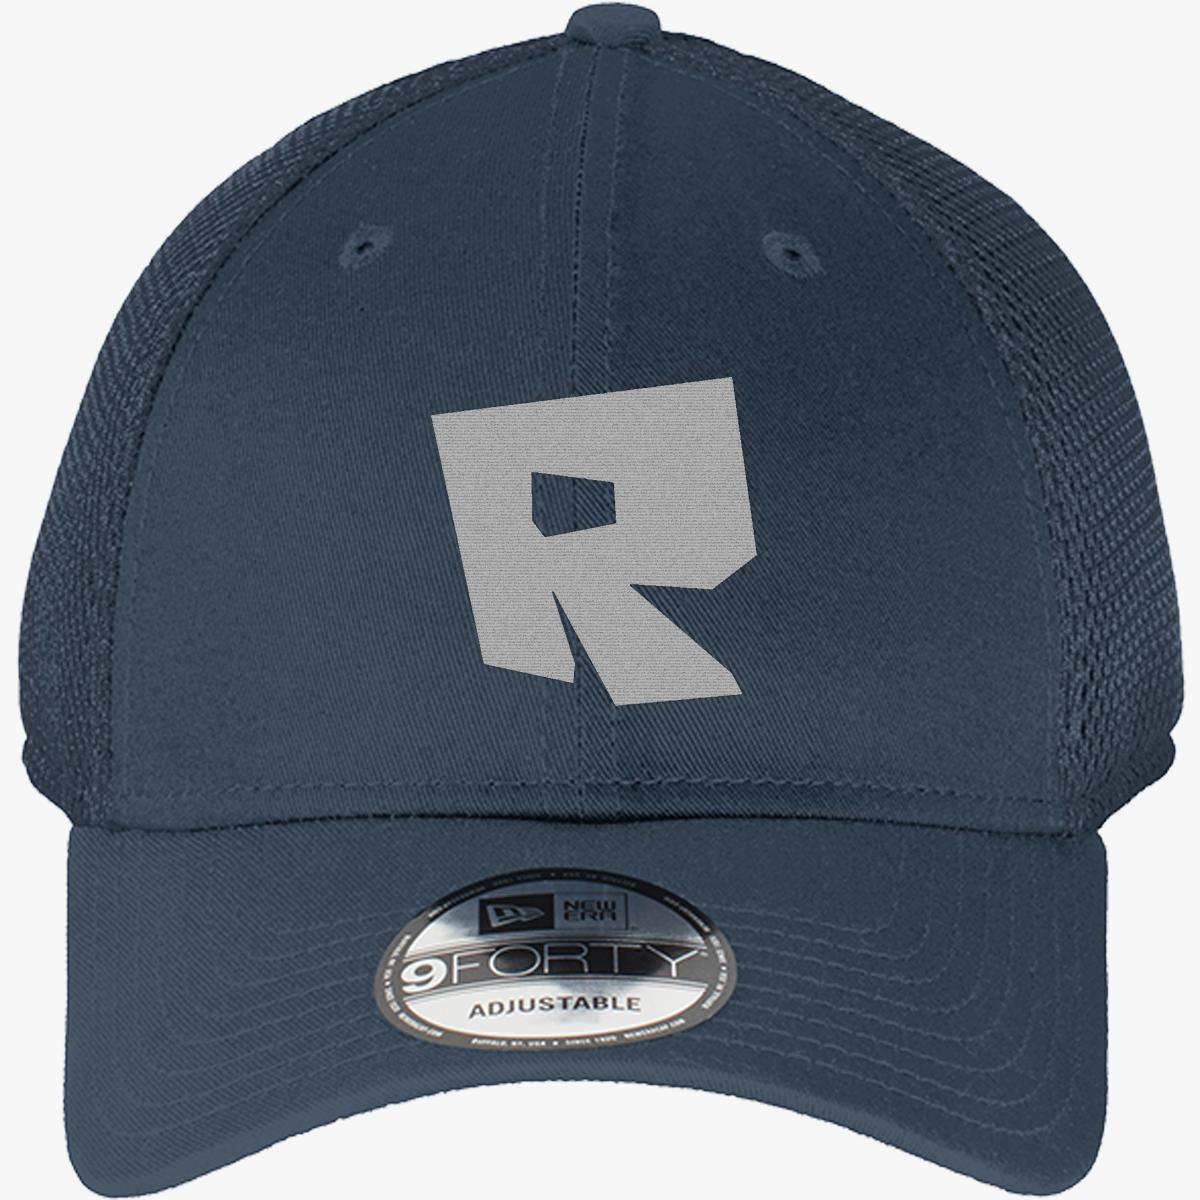 8a289321c915 Roblox Logo New Era Baseball Mesh Cap (Embroidered) - Customon